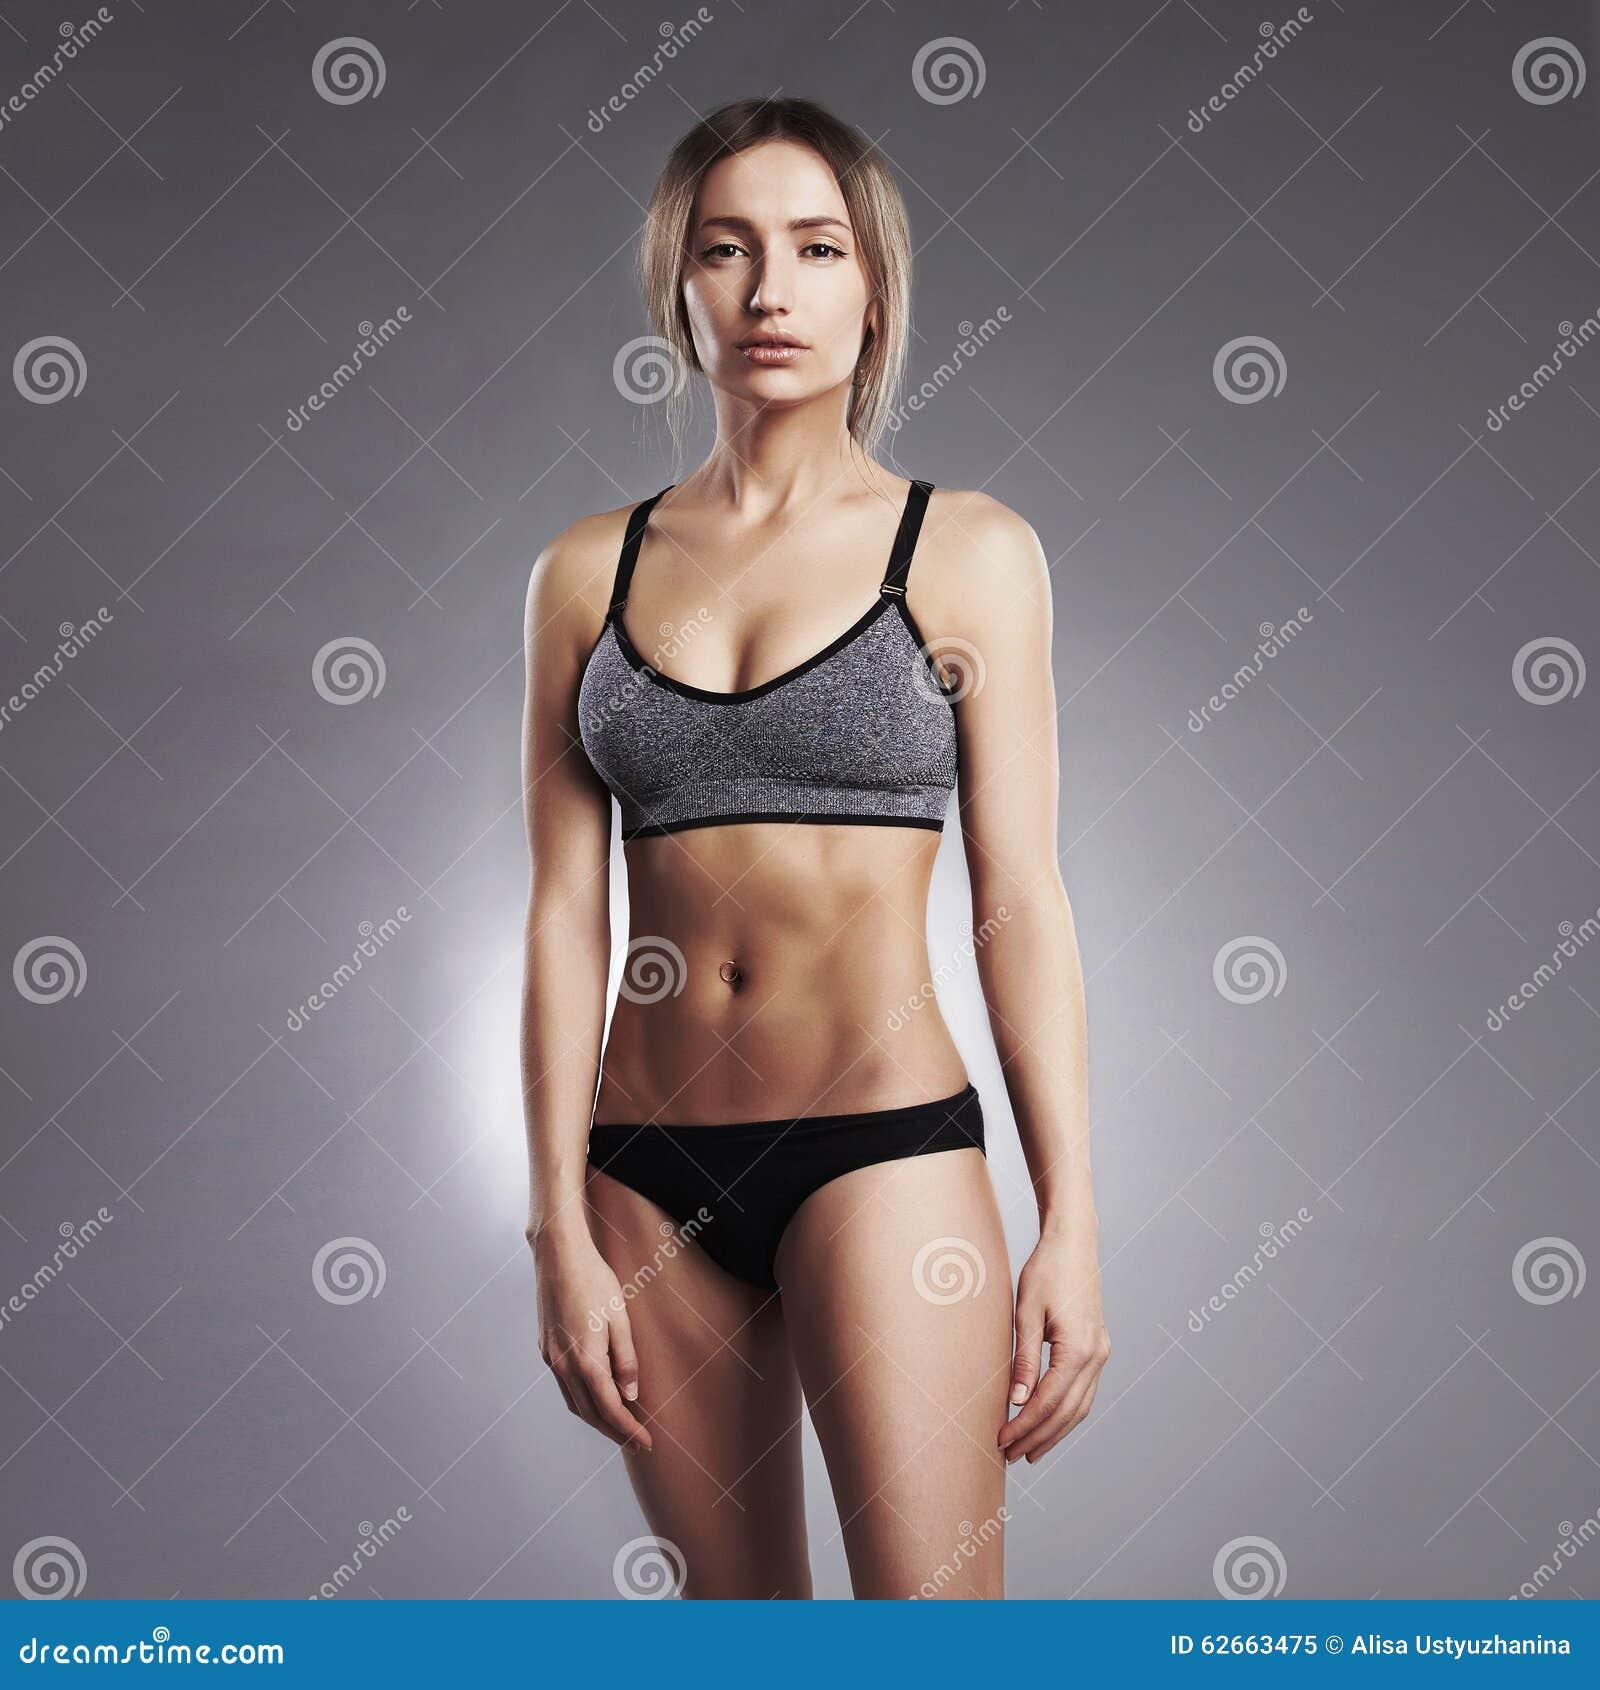 american pie naked mile fat girlfriend